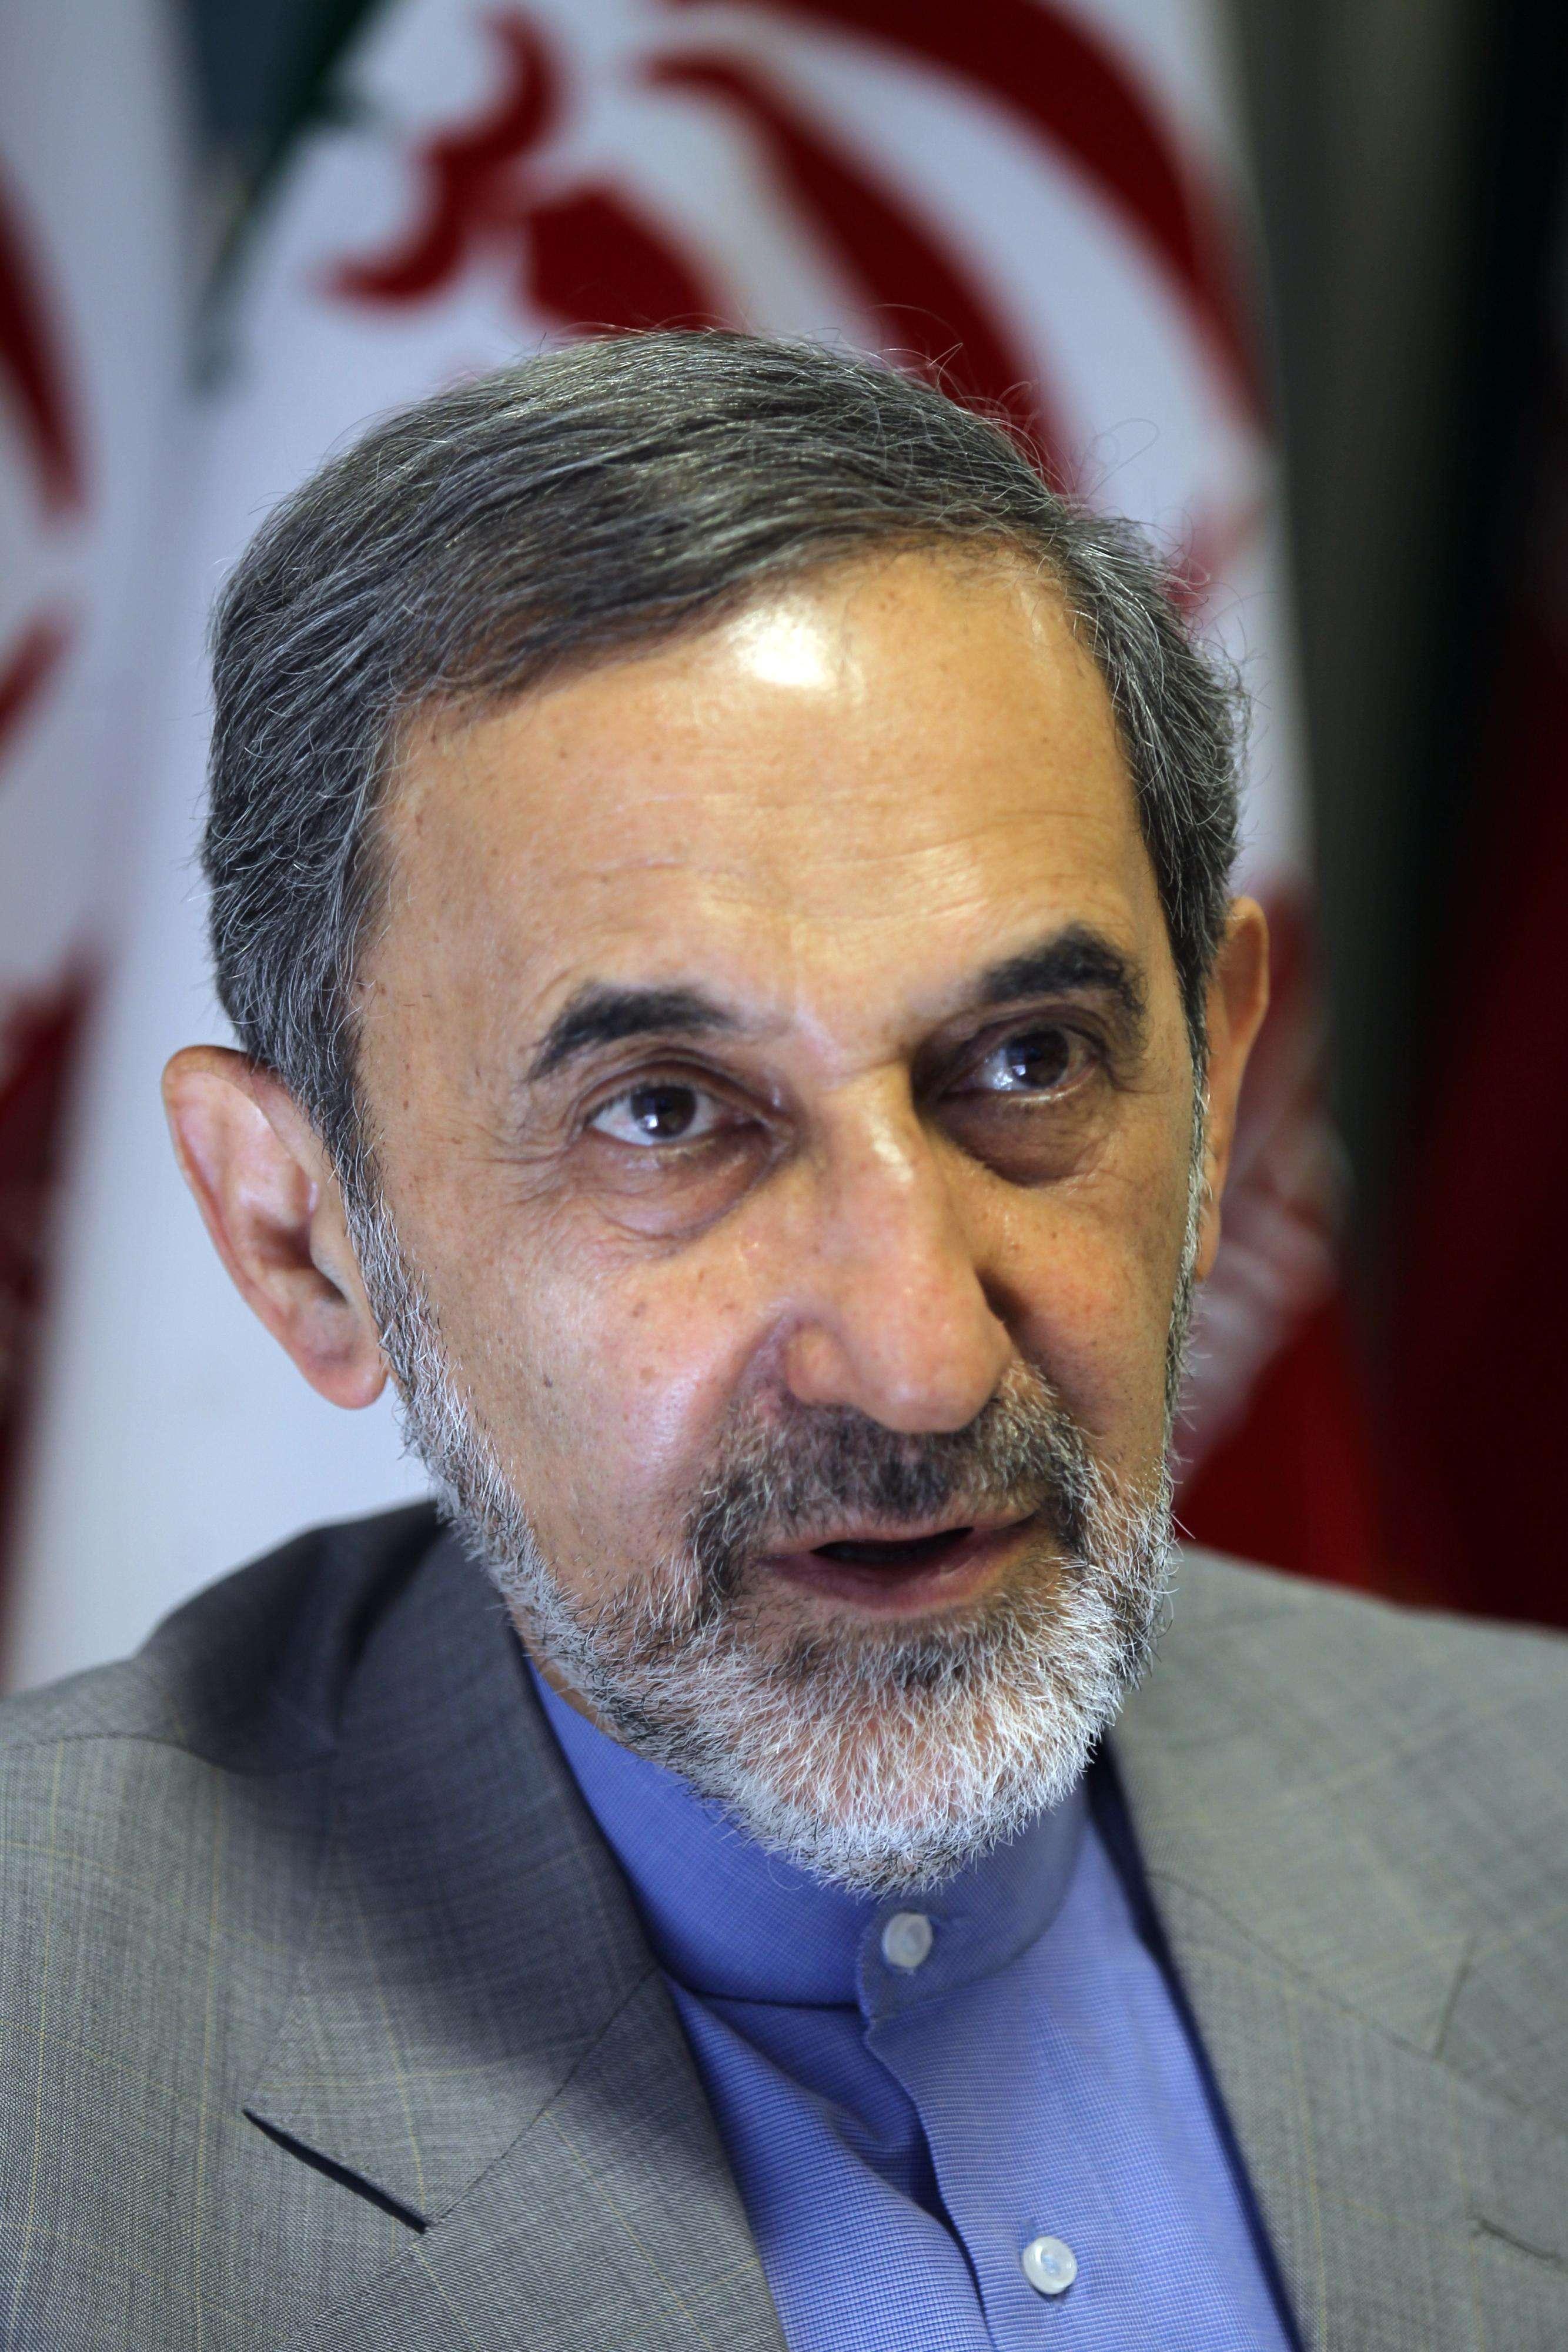 Ali Akbar Velayati, influente assessor do líder supremo iraniano, Ali Khamenei Foto: ATTA KENARE/AFP